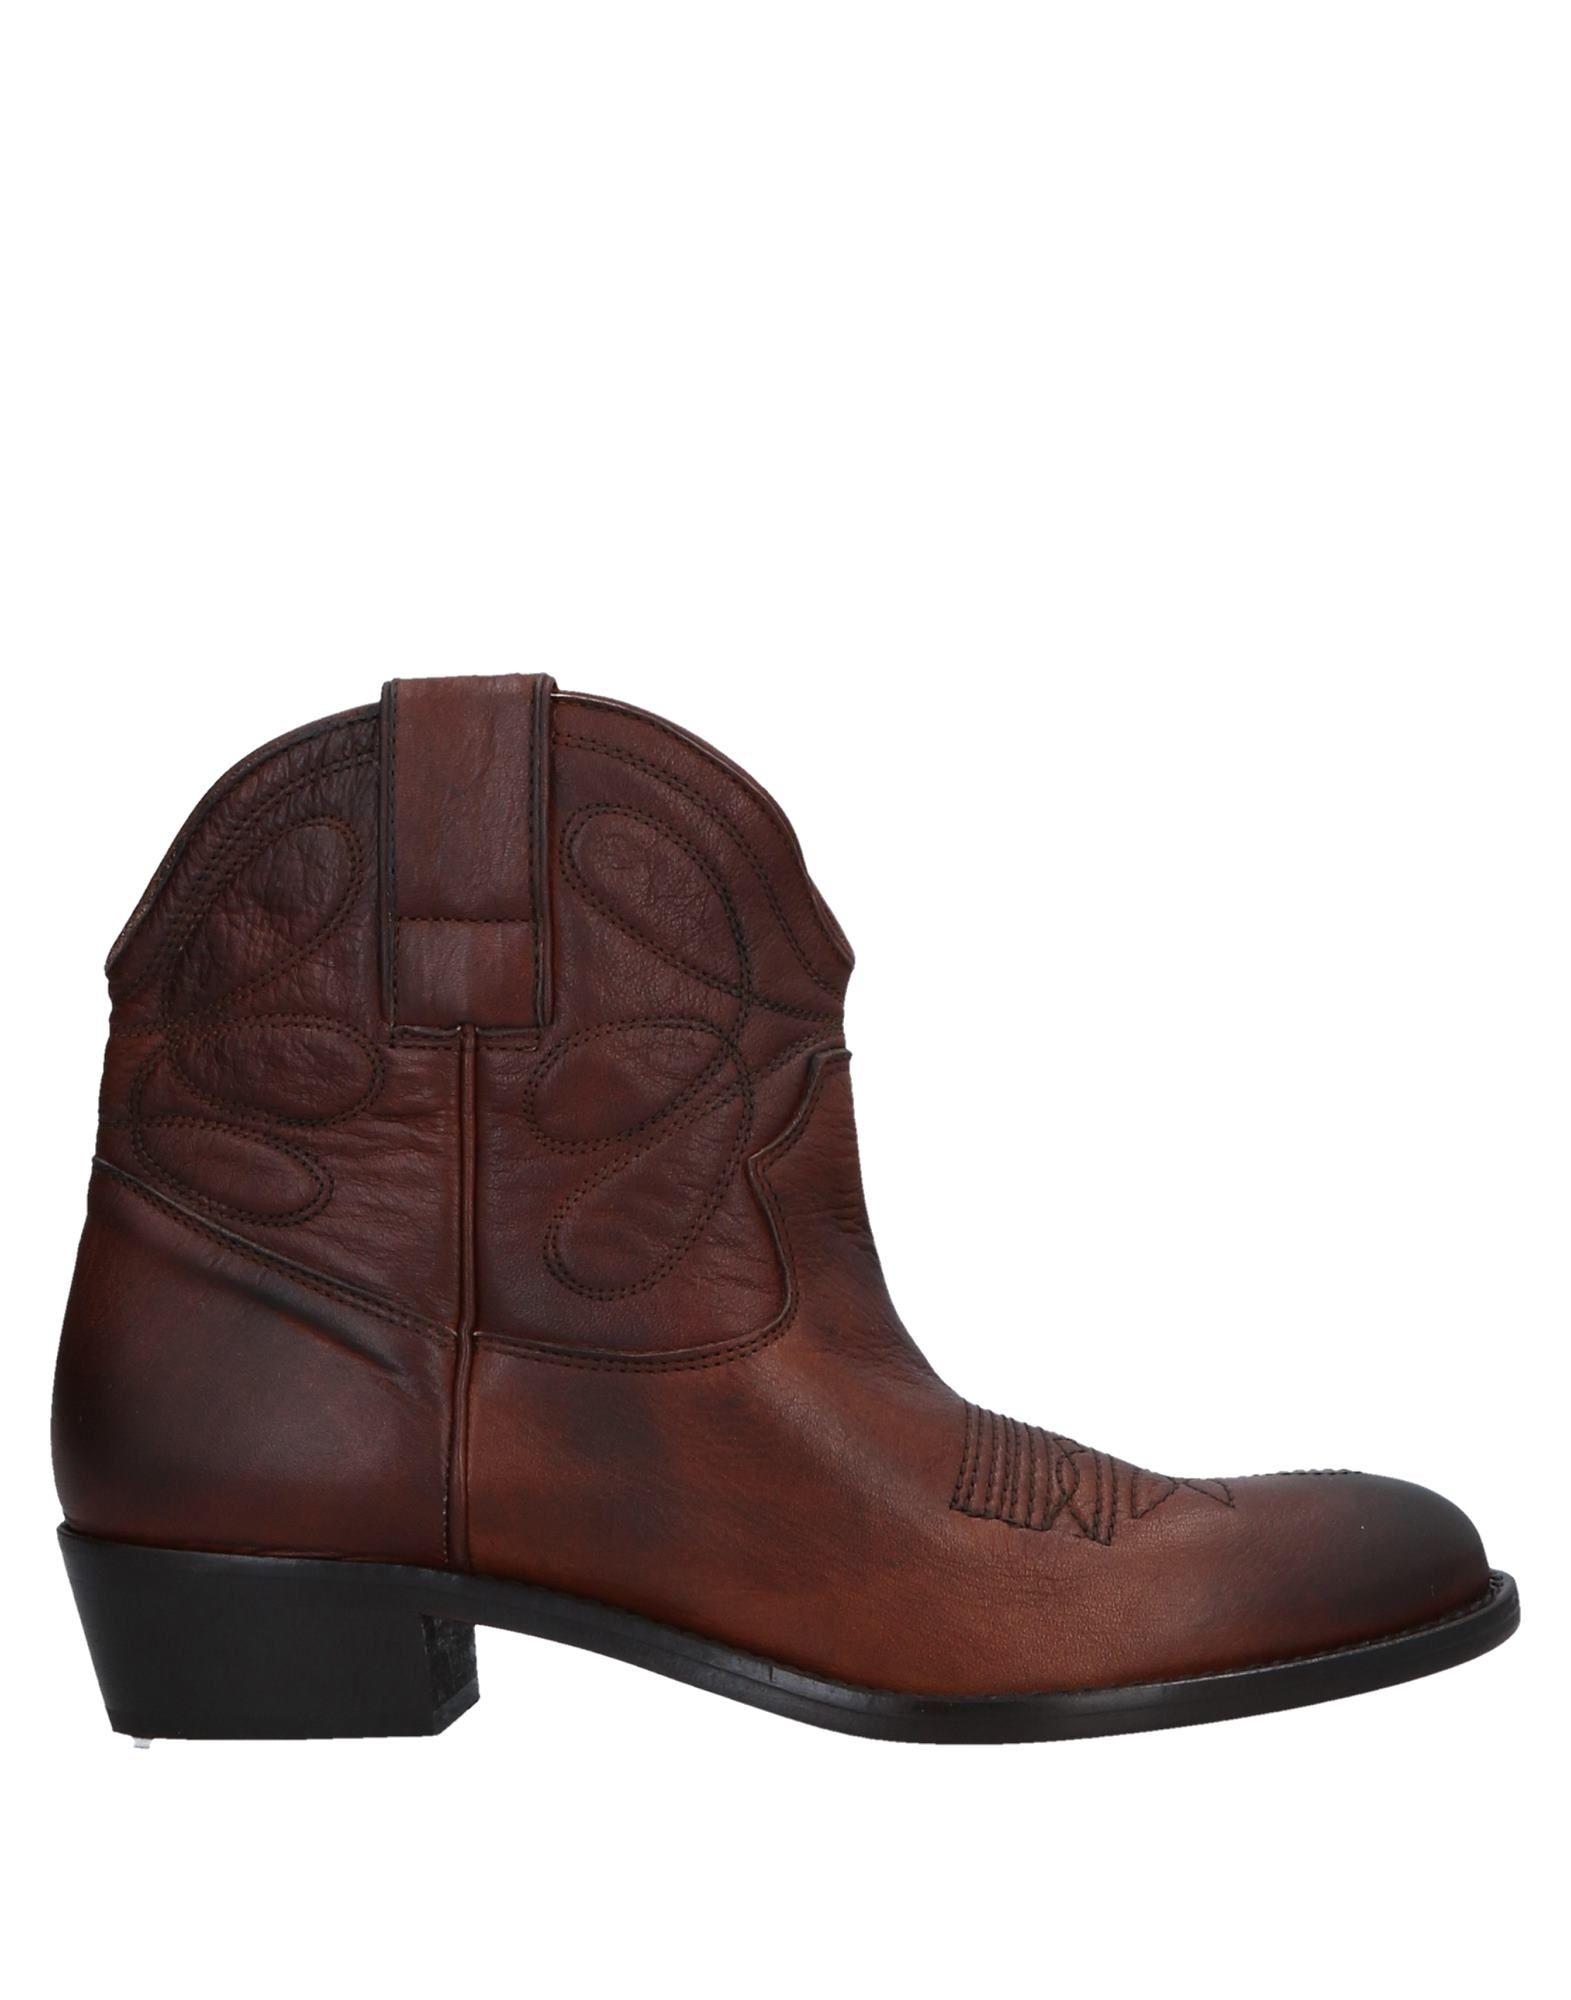 Key Té Stiefelette Damen  11518096XQGut aussehende strapazierfähige Schuhe